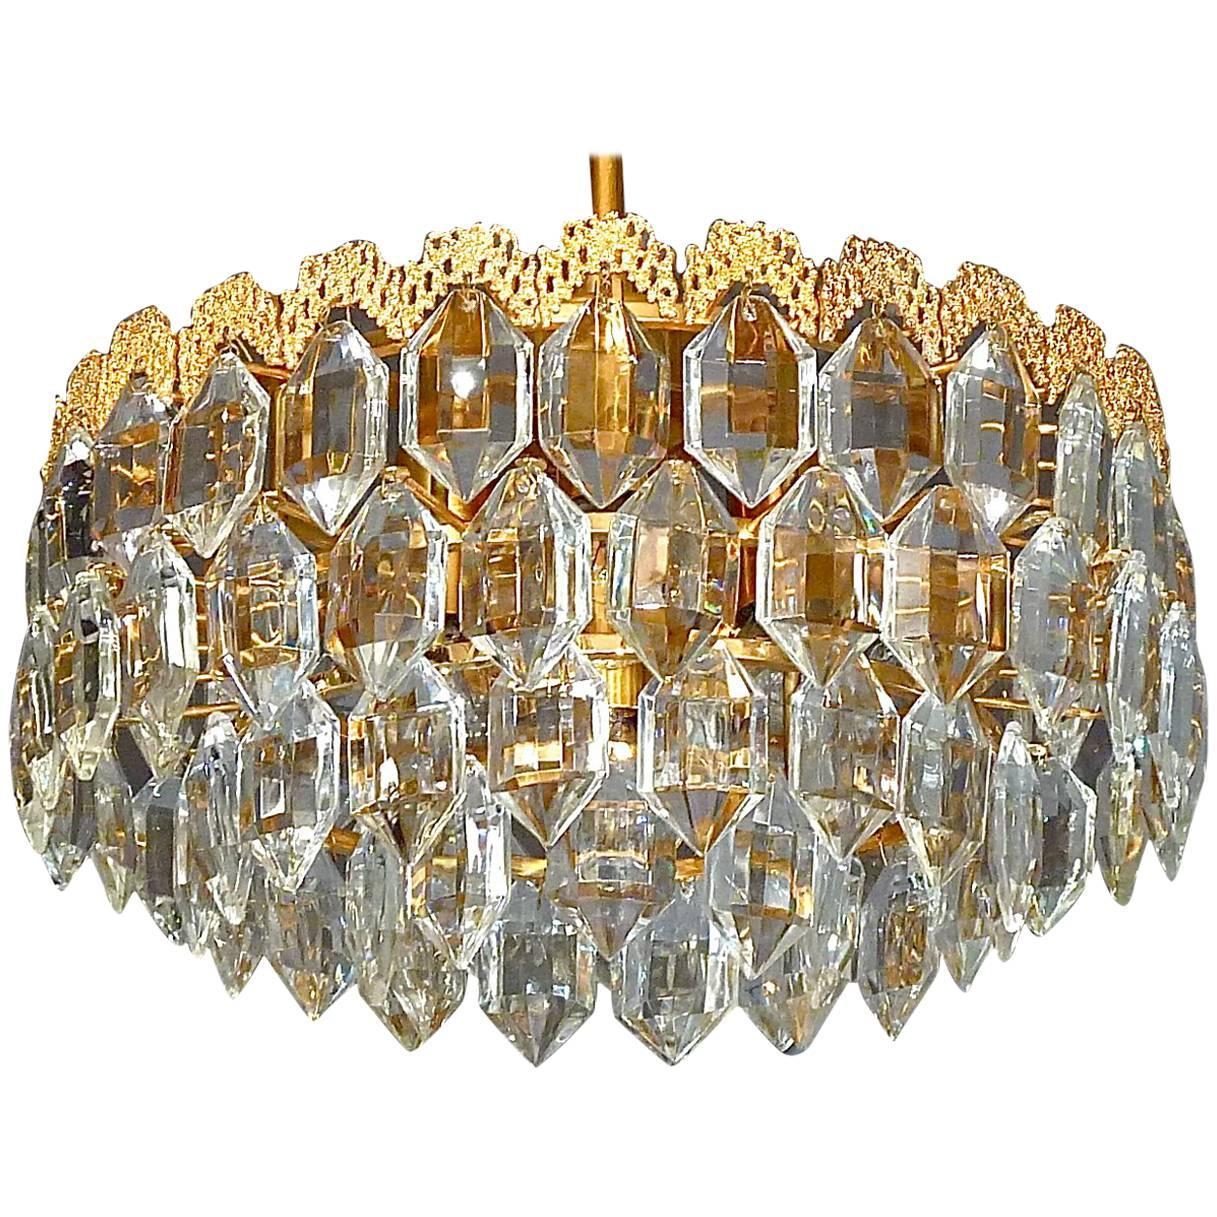 Midcentury Bakalowits Chandelier Gilt Brass Faceted Crystal Glass Austria 1960s